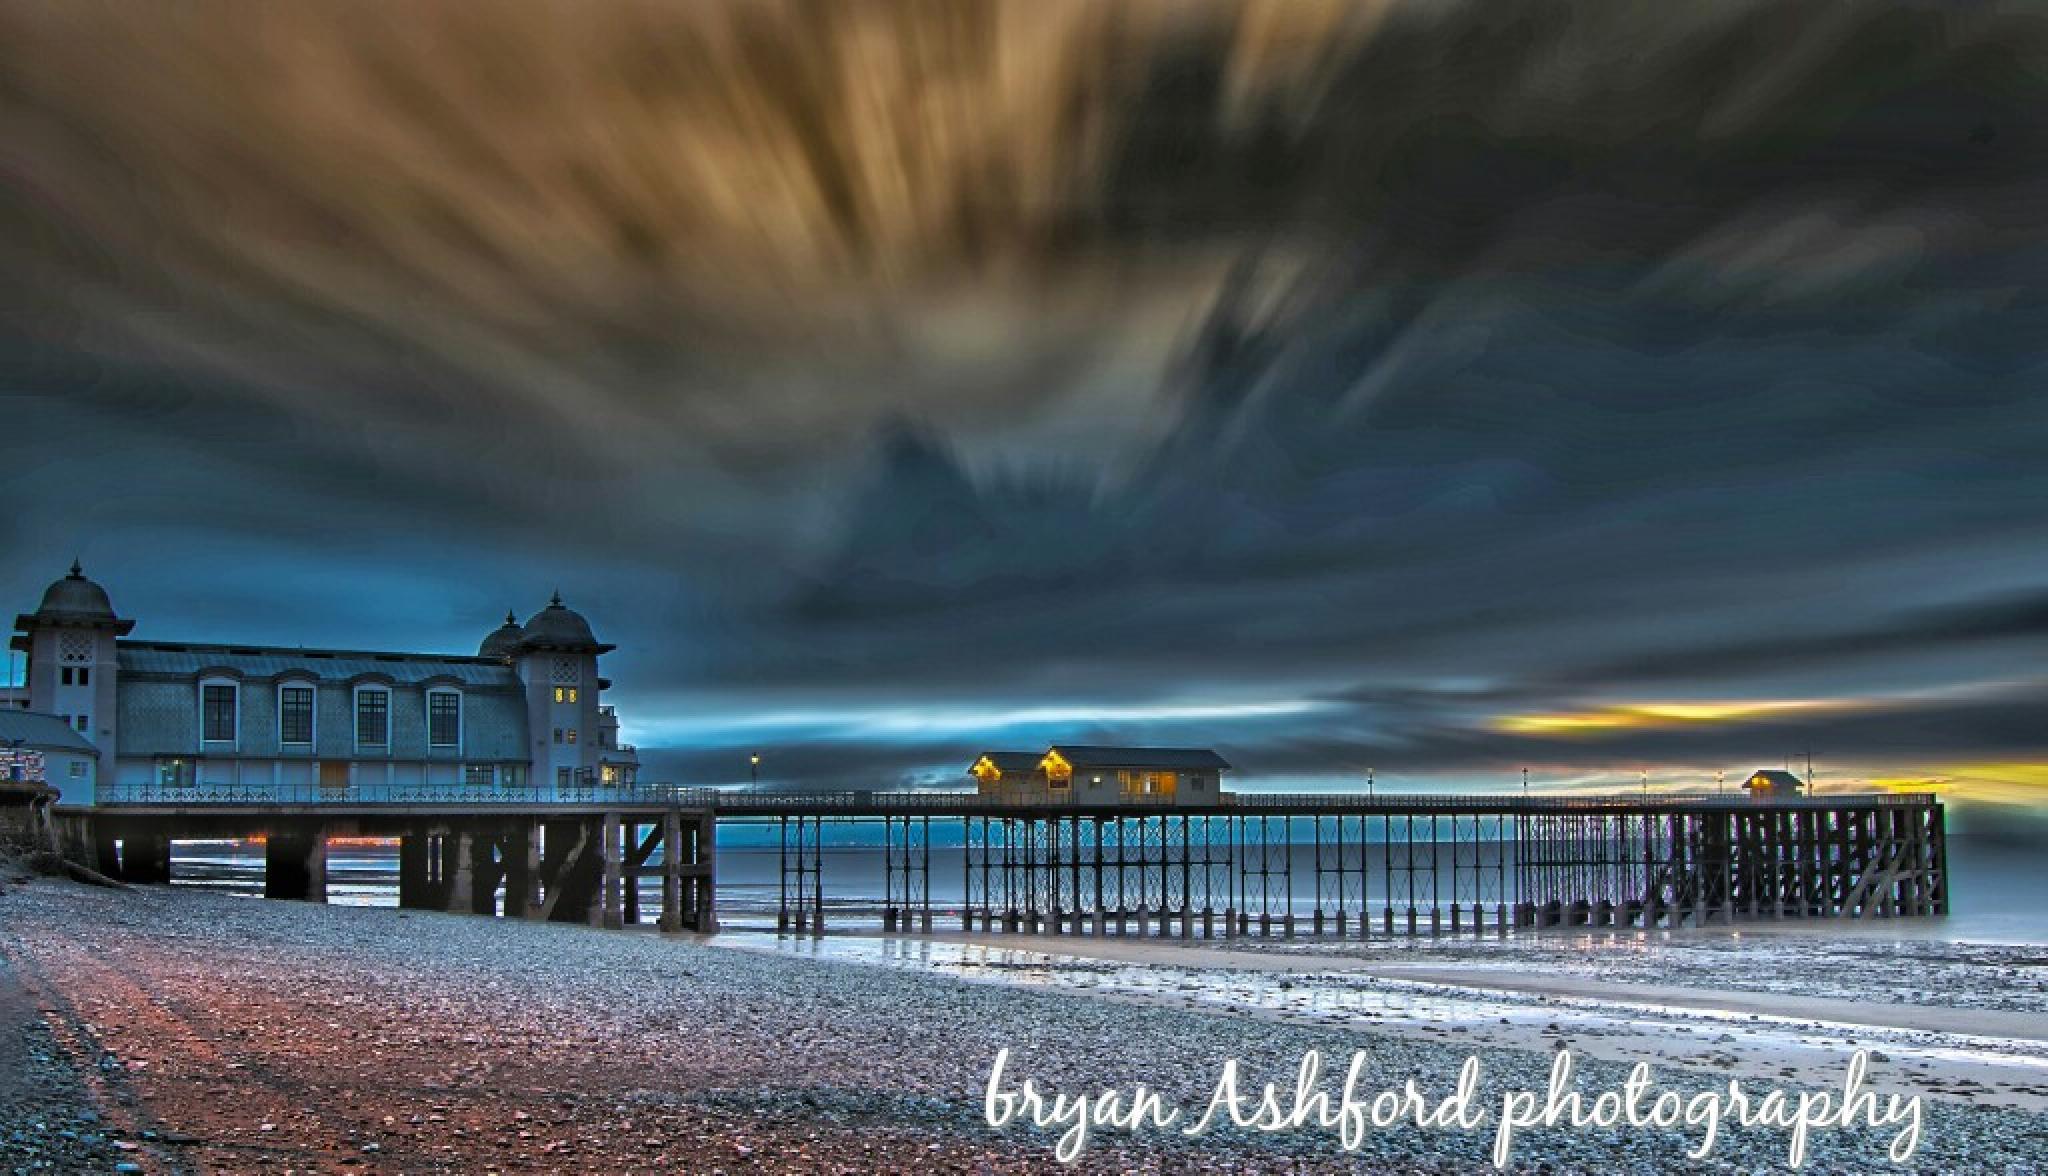 day soon becomes night by bryan.ashford 52